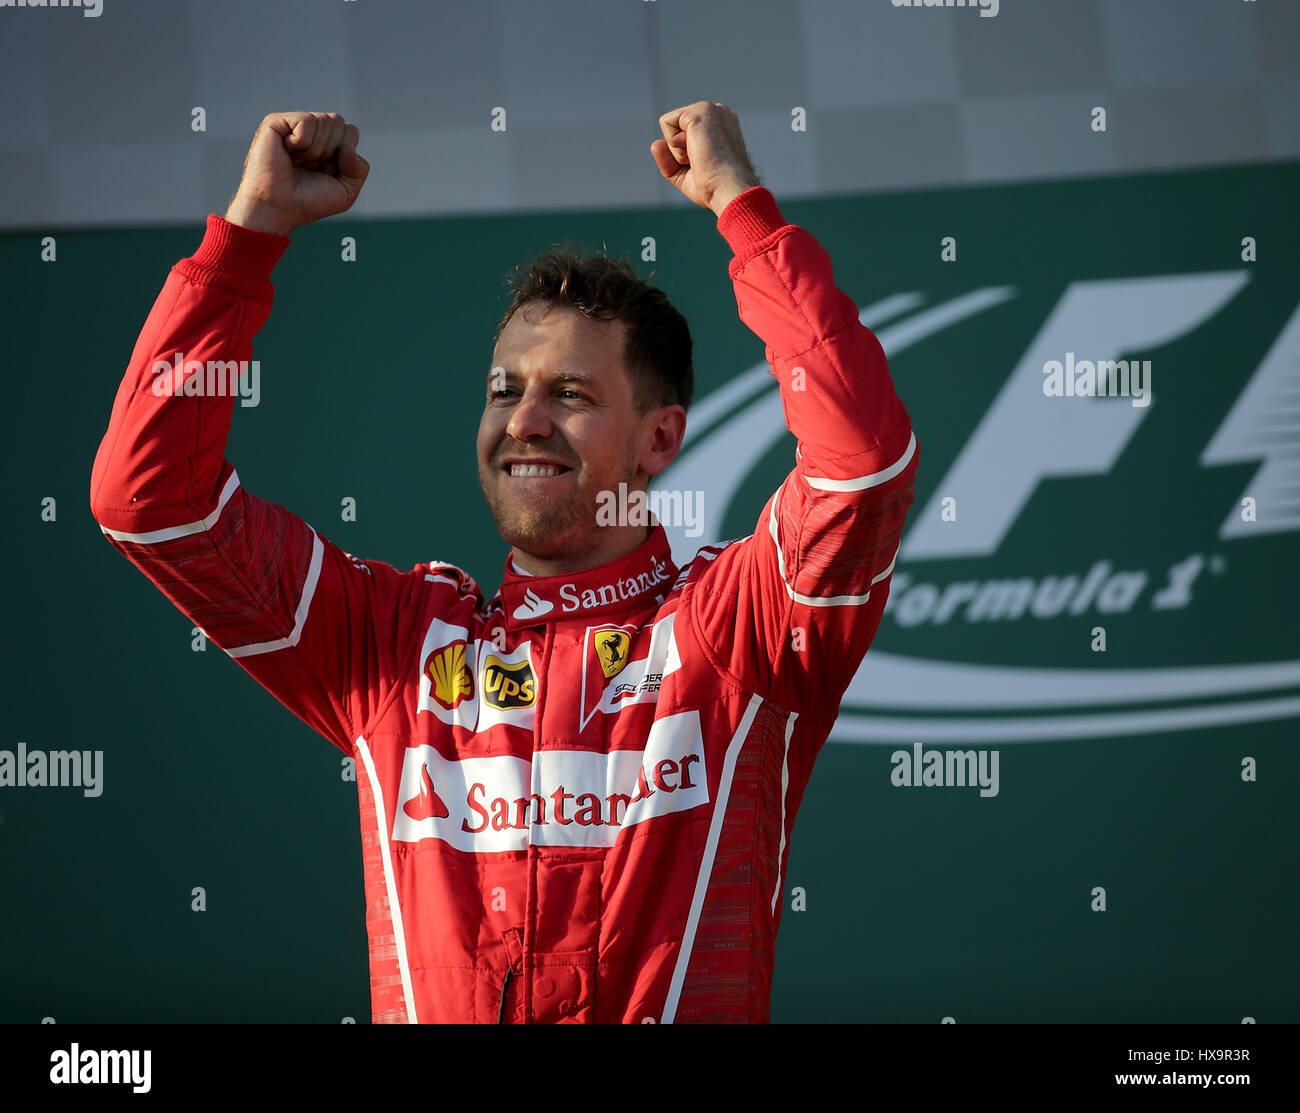 Melbourne, Australien. 26. März 2017.  Formel 1 Rolex Australian Grand Prix, 23. -26.03.2017 Podium in Melbourne: Stockfoto